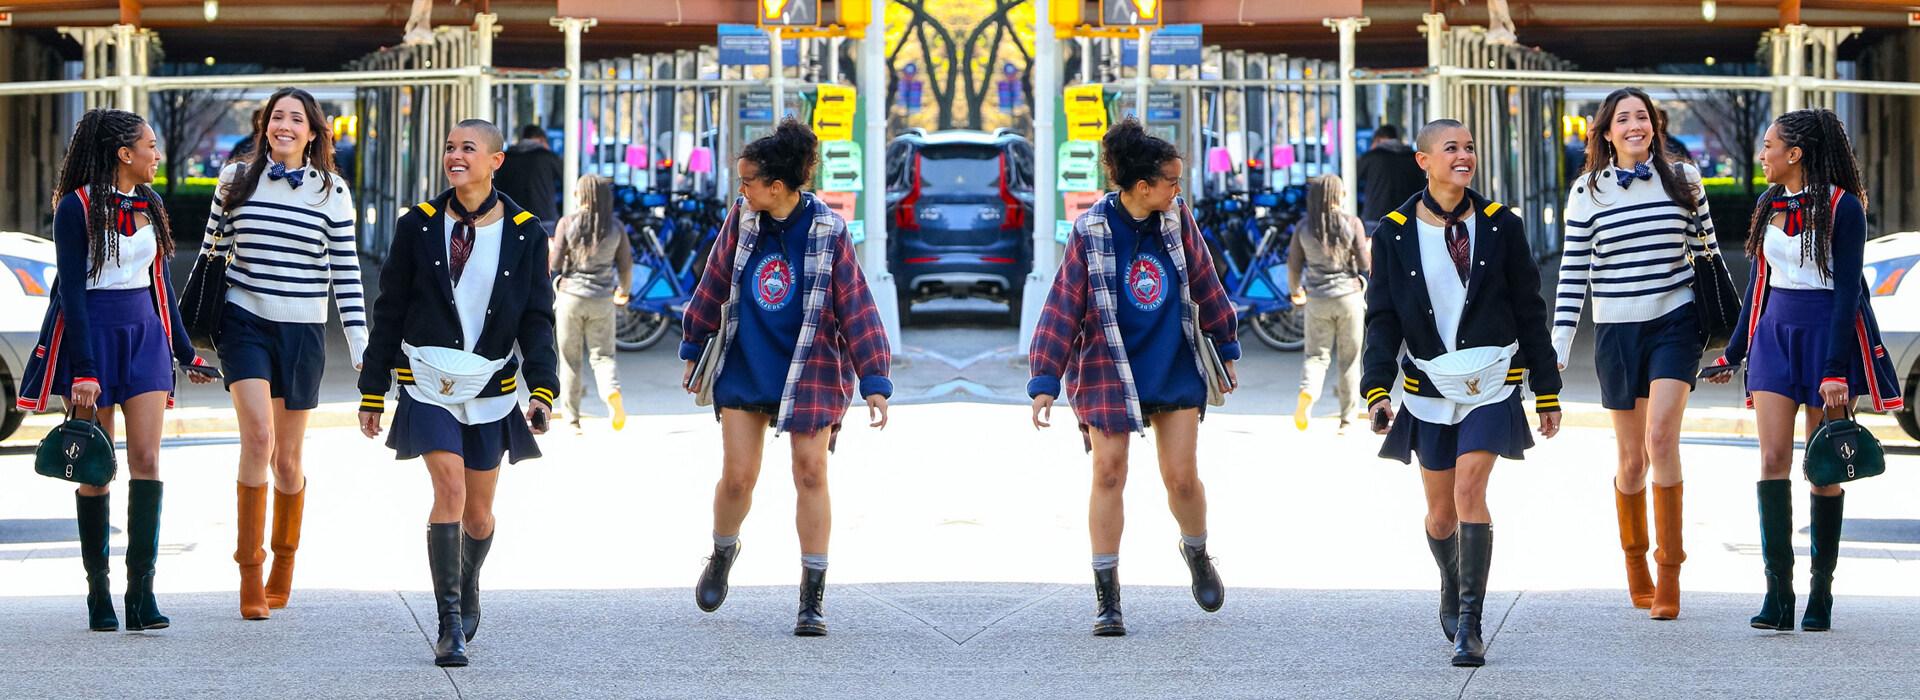 metcha Gossip-Girl-XOXO internal 01-v2 - IMAGE